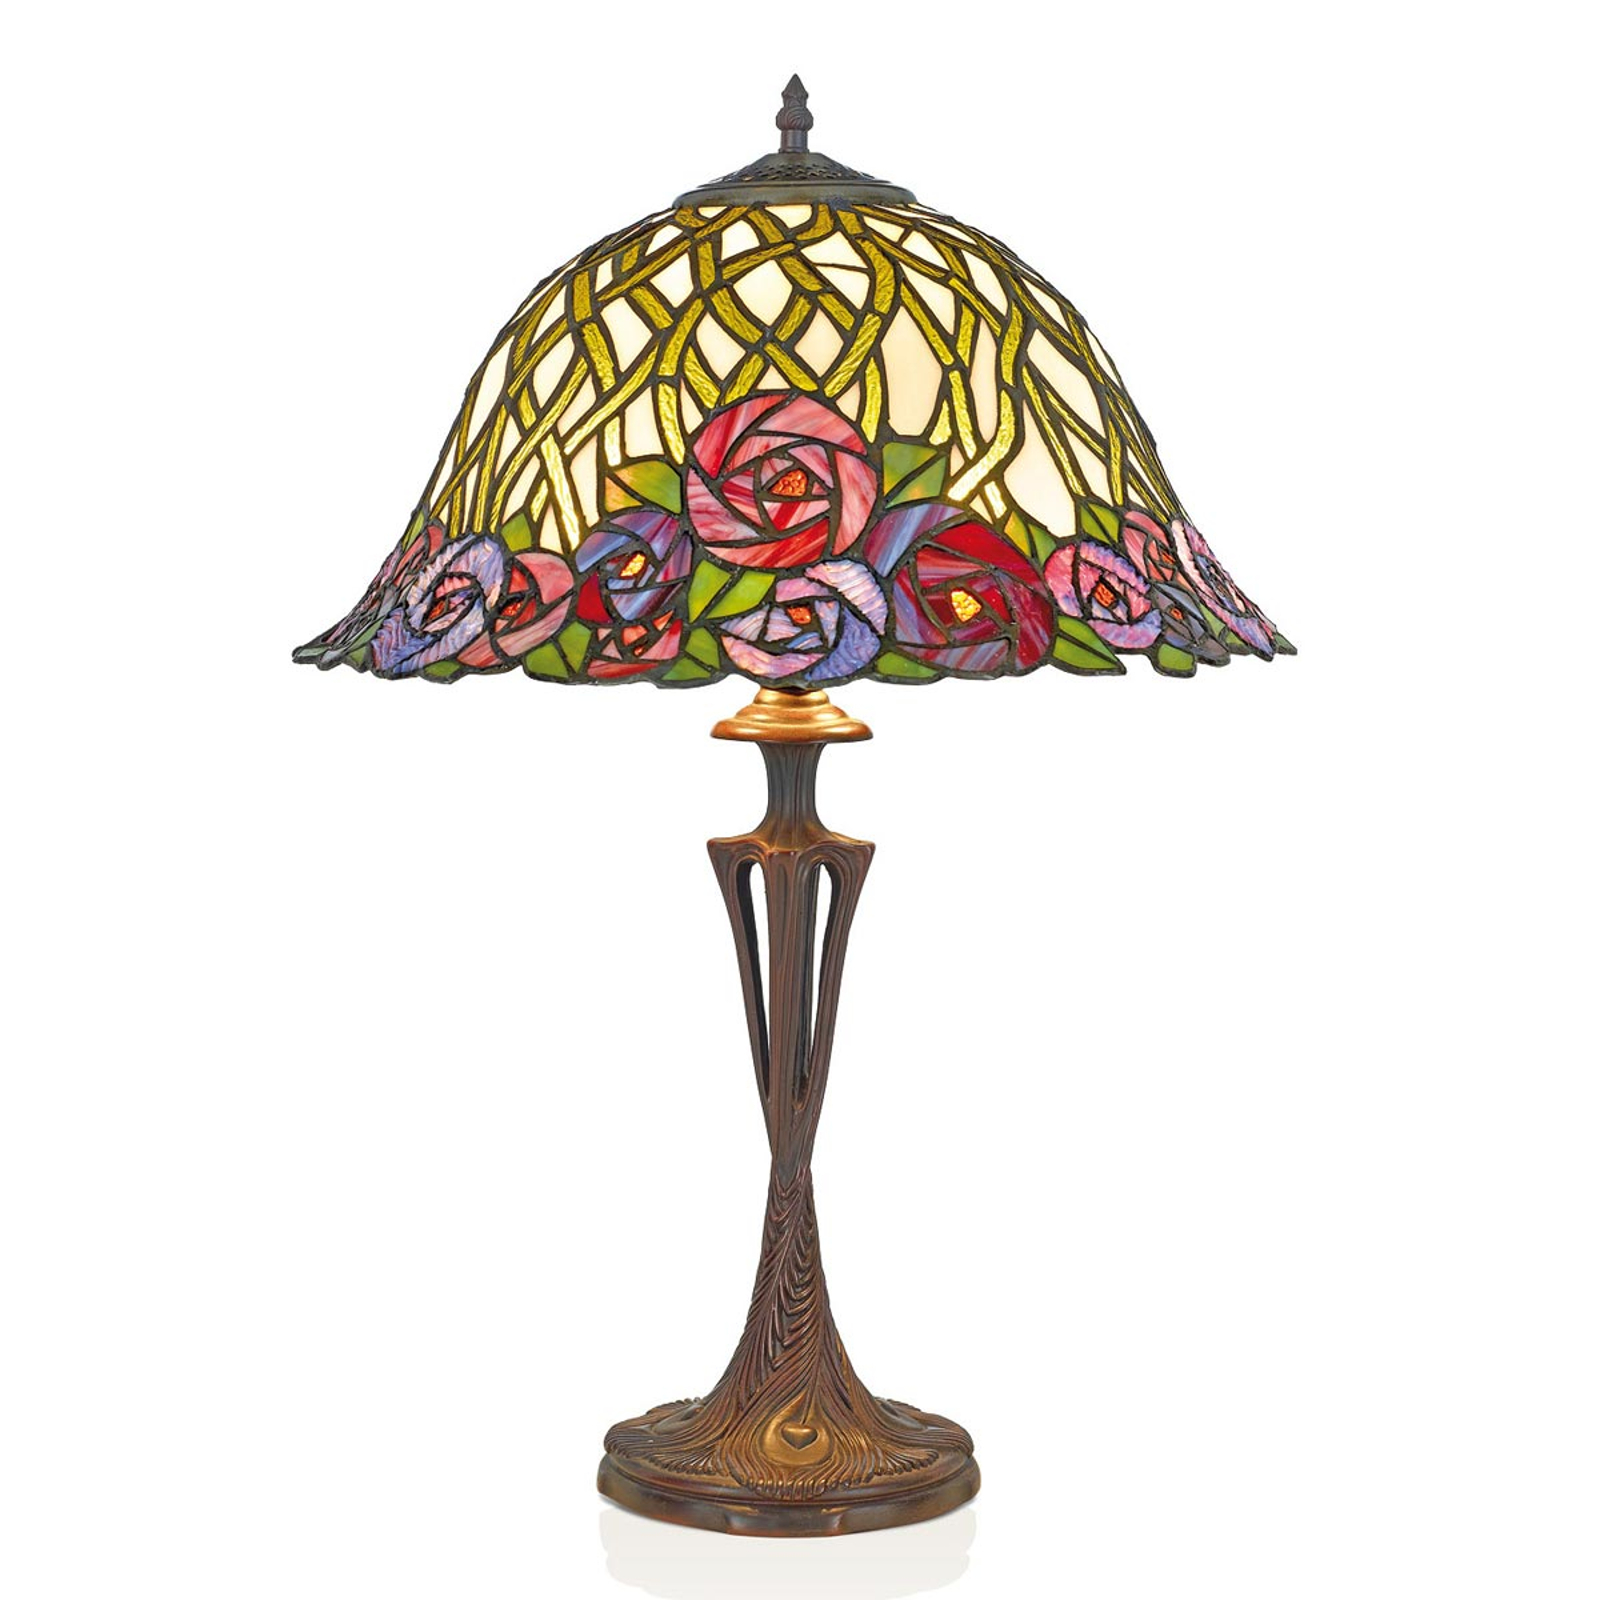 Bloemige tafellamp Melika